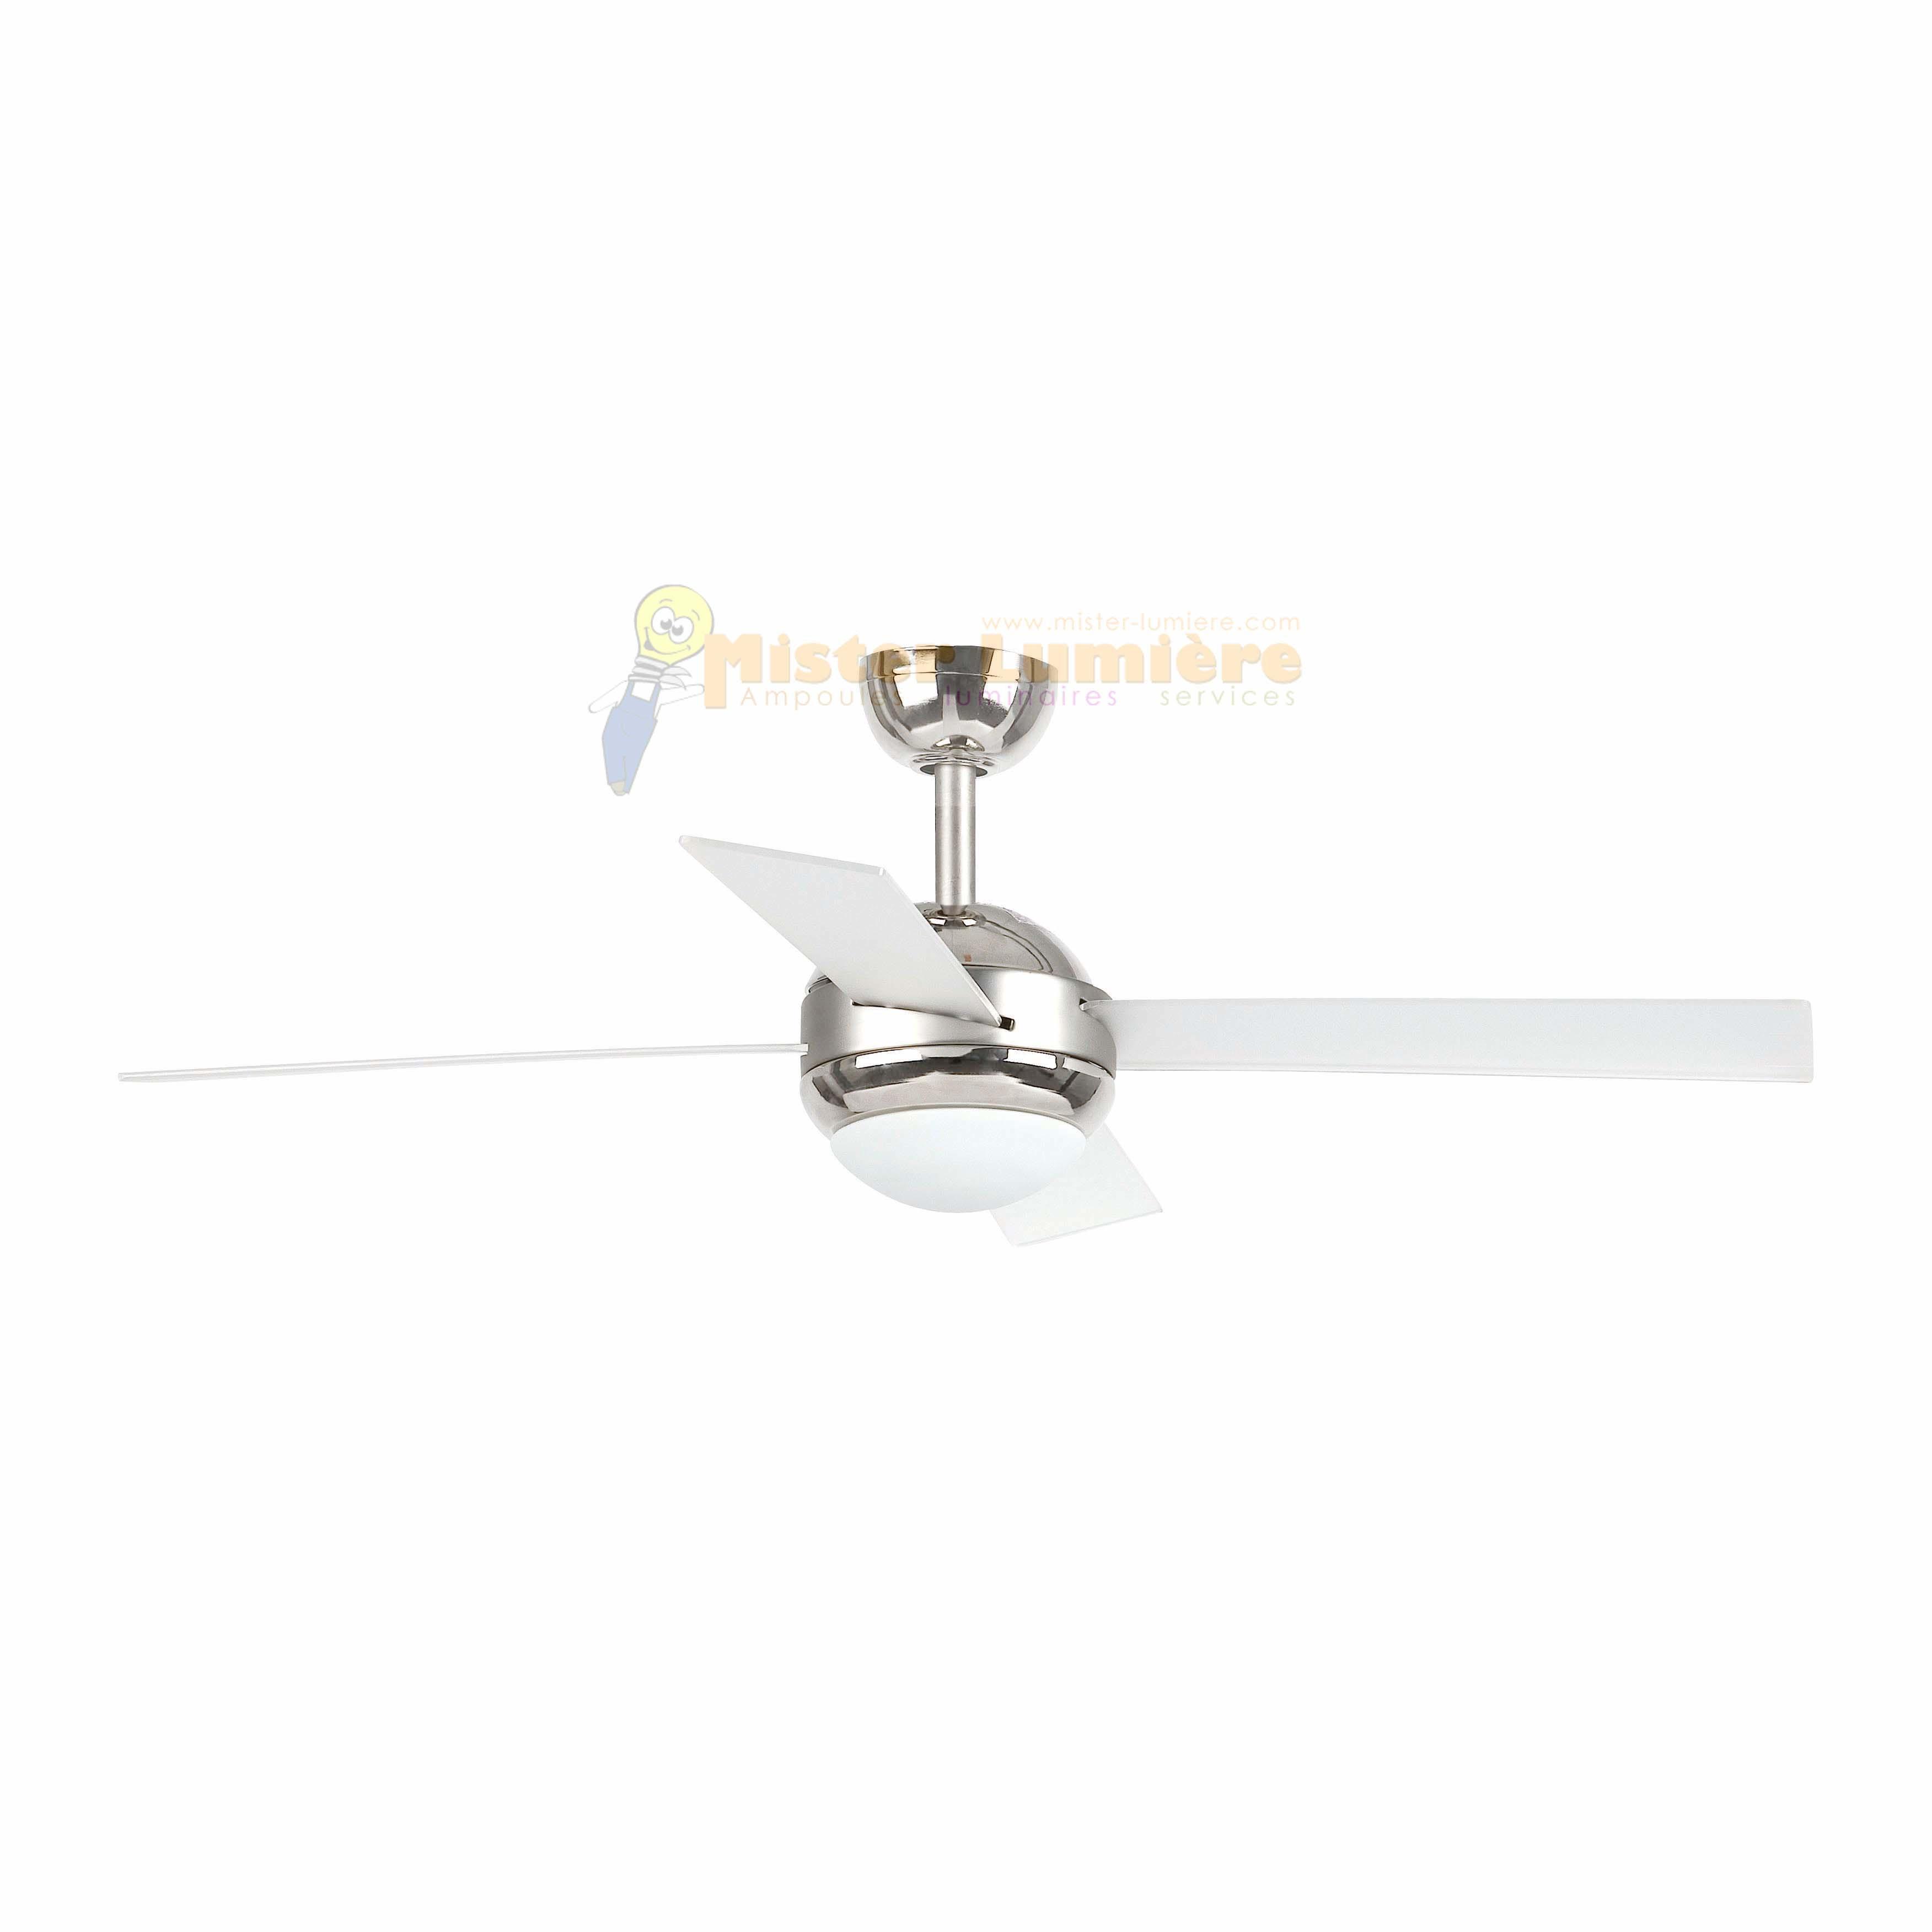 Ventilateur de plafond lumineux télécommandé HONOLULU nickel mat